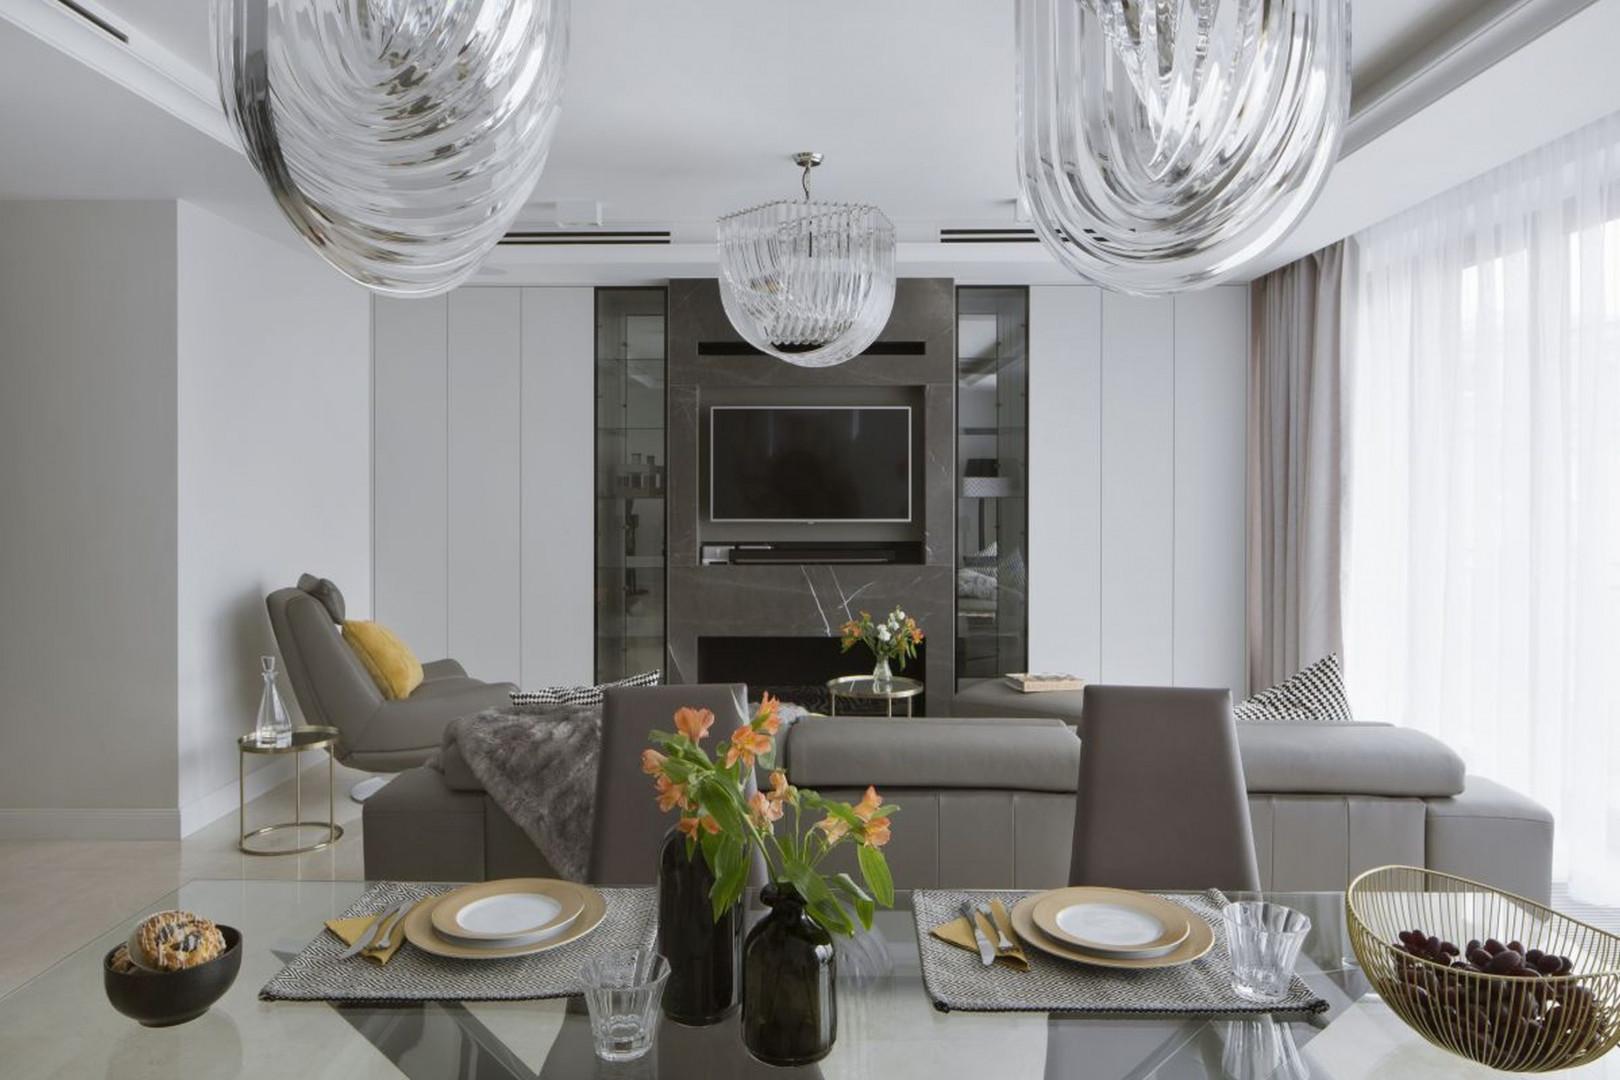 Apartment_w_Centrum_Yassen_Hristov_Hompics.jpg